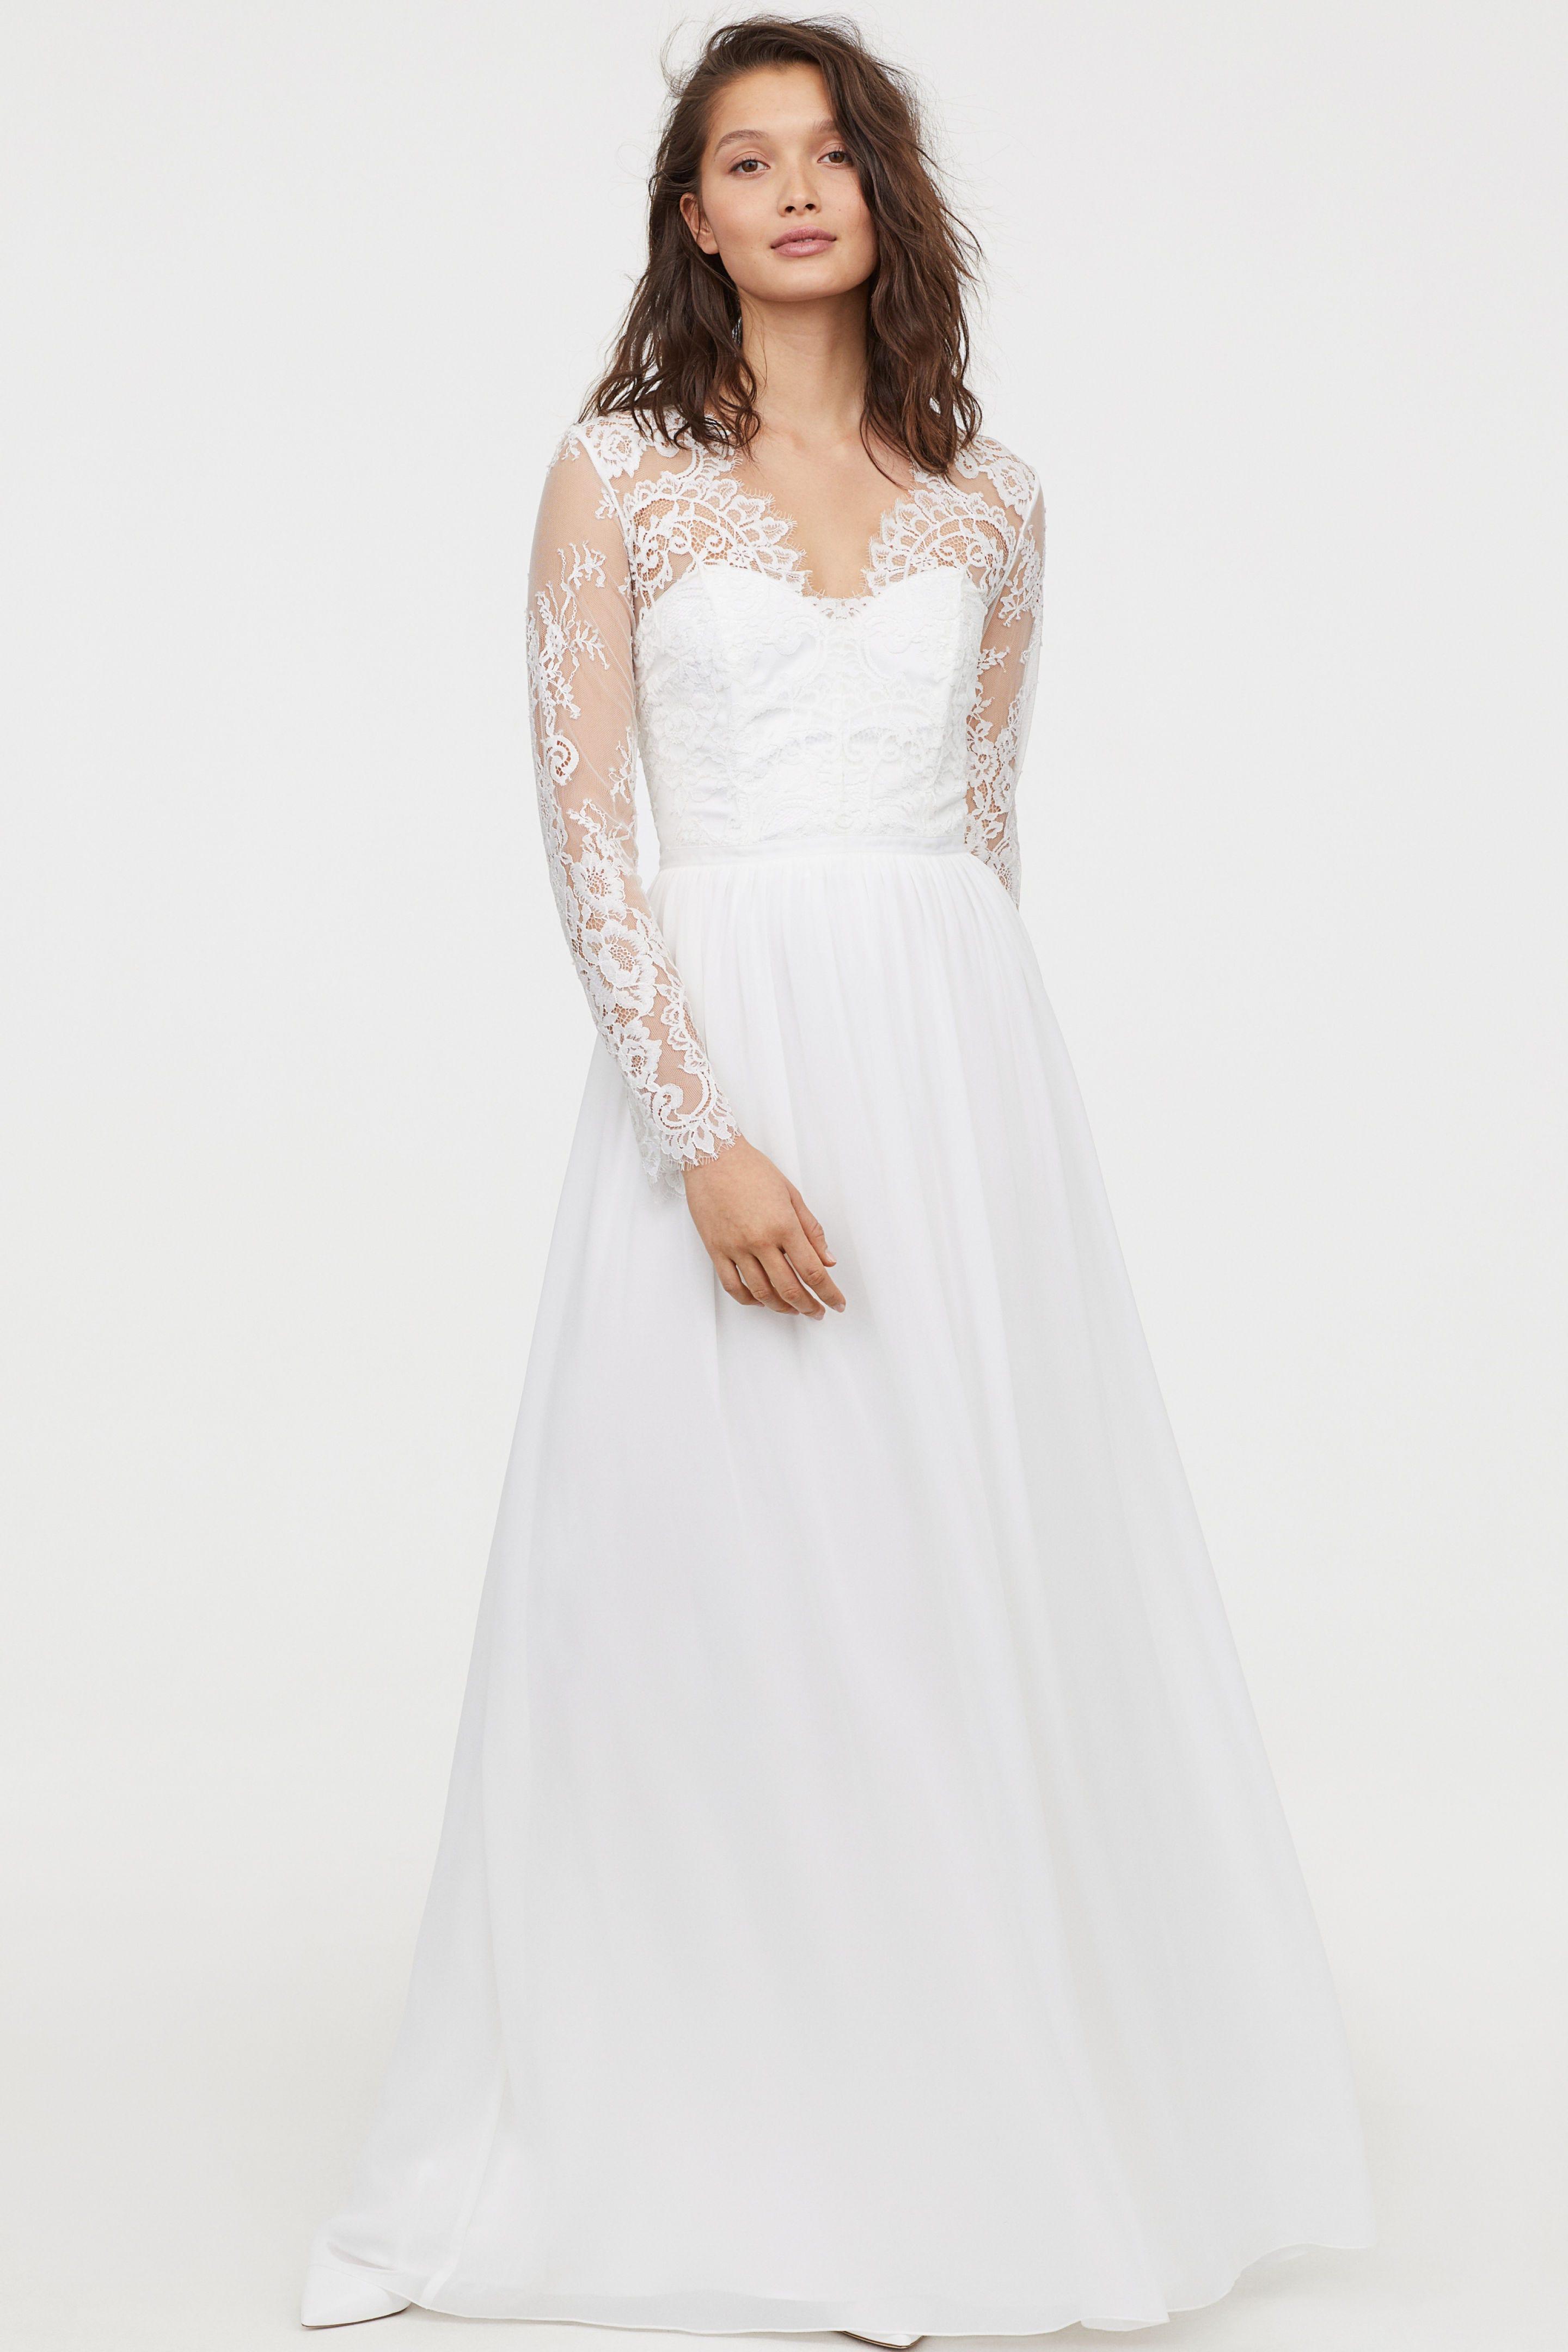 6748b4338def H&M Restocked Kate Middleton Dress in 2019 Wedding Edit